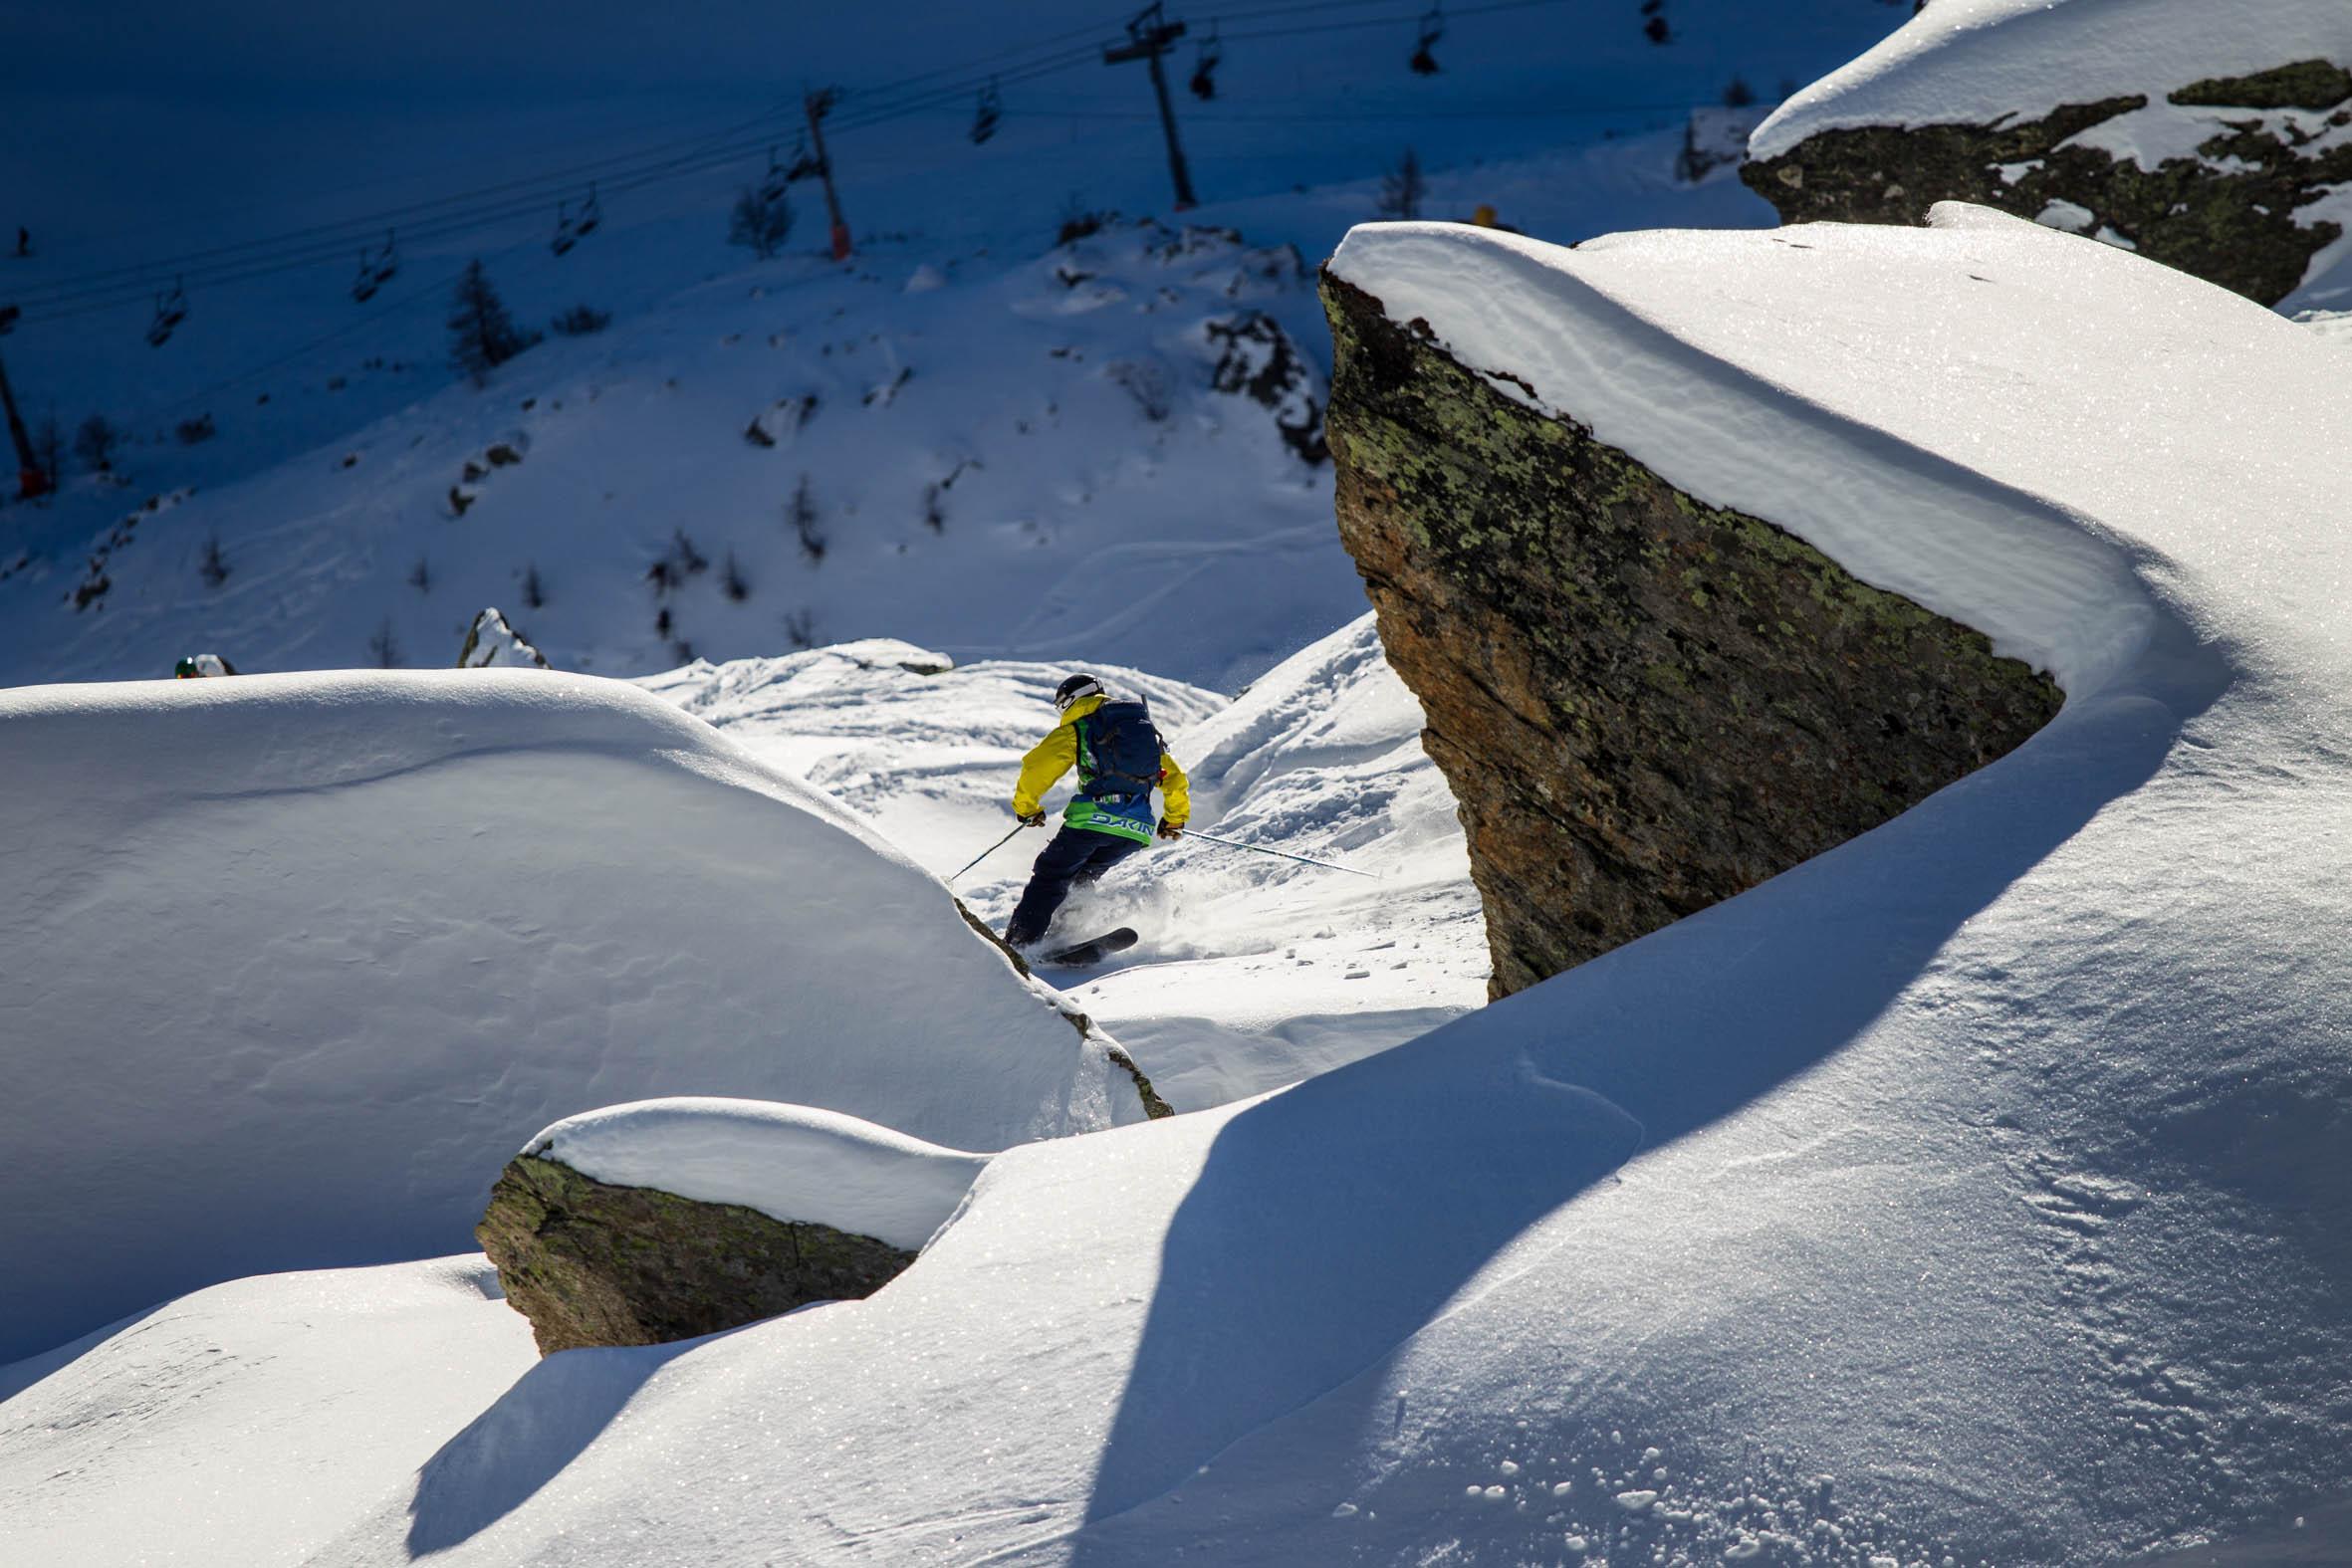 Freeride Junior Tour 2015 Chamonix-Mont-Blanc By Dakine - Tim Lloyd